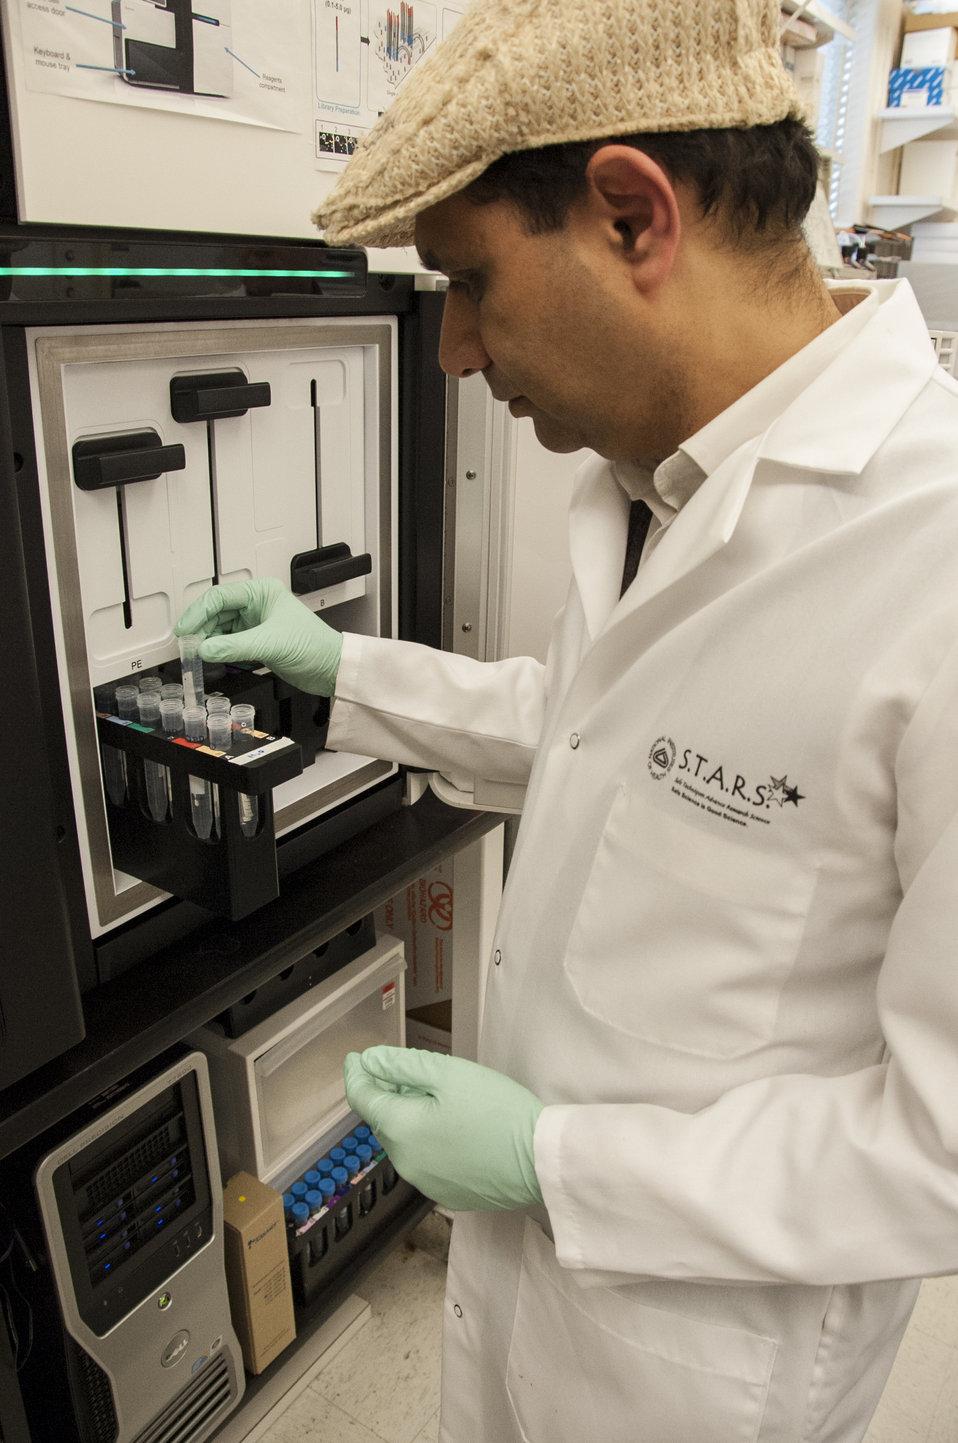 Bio Threats: FDA's A-Team (6328)